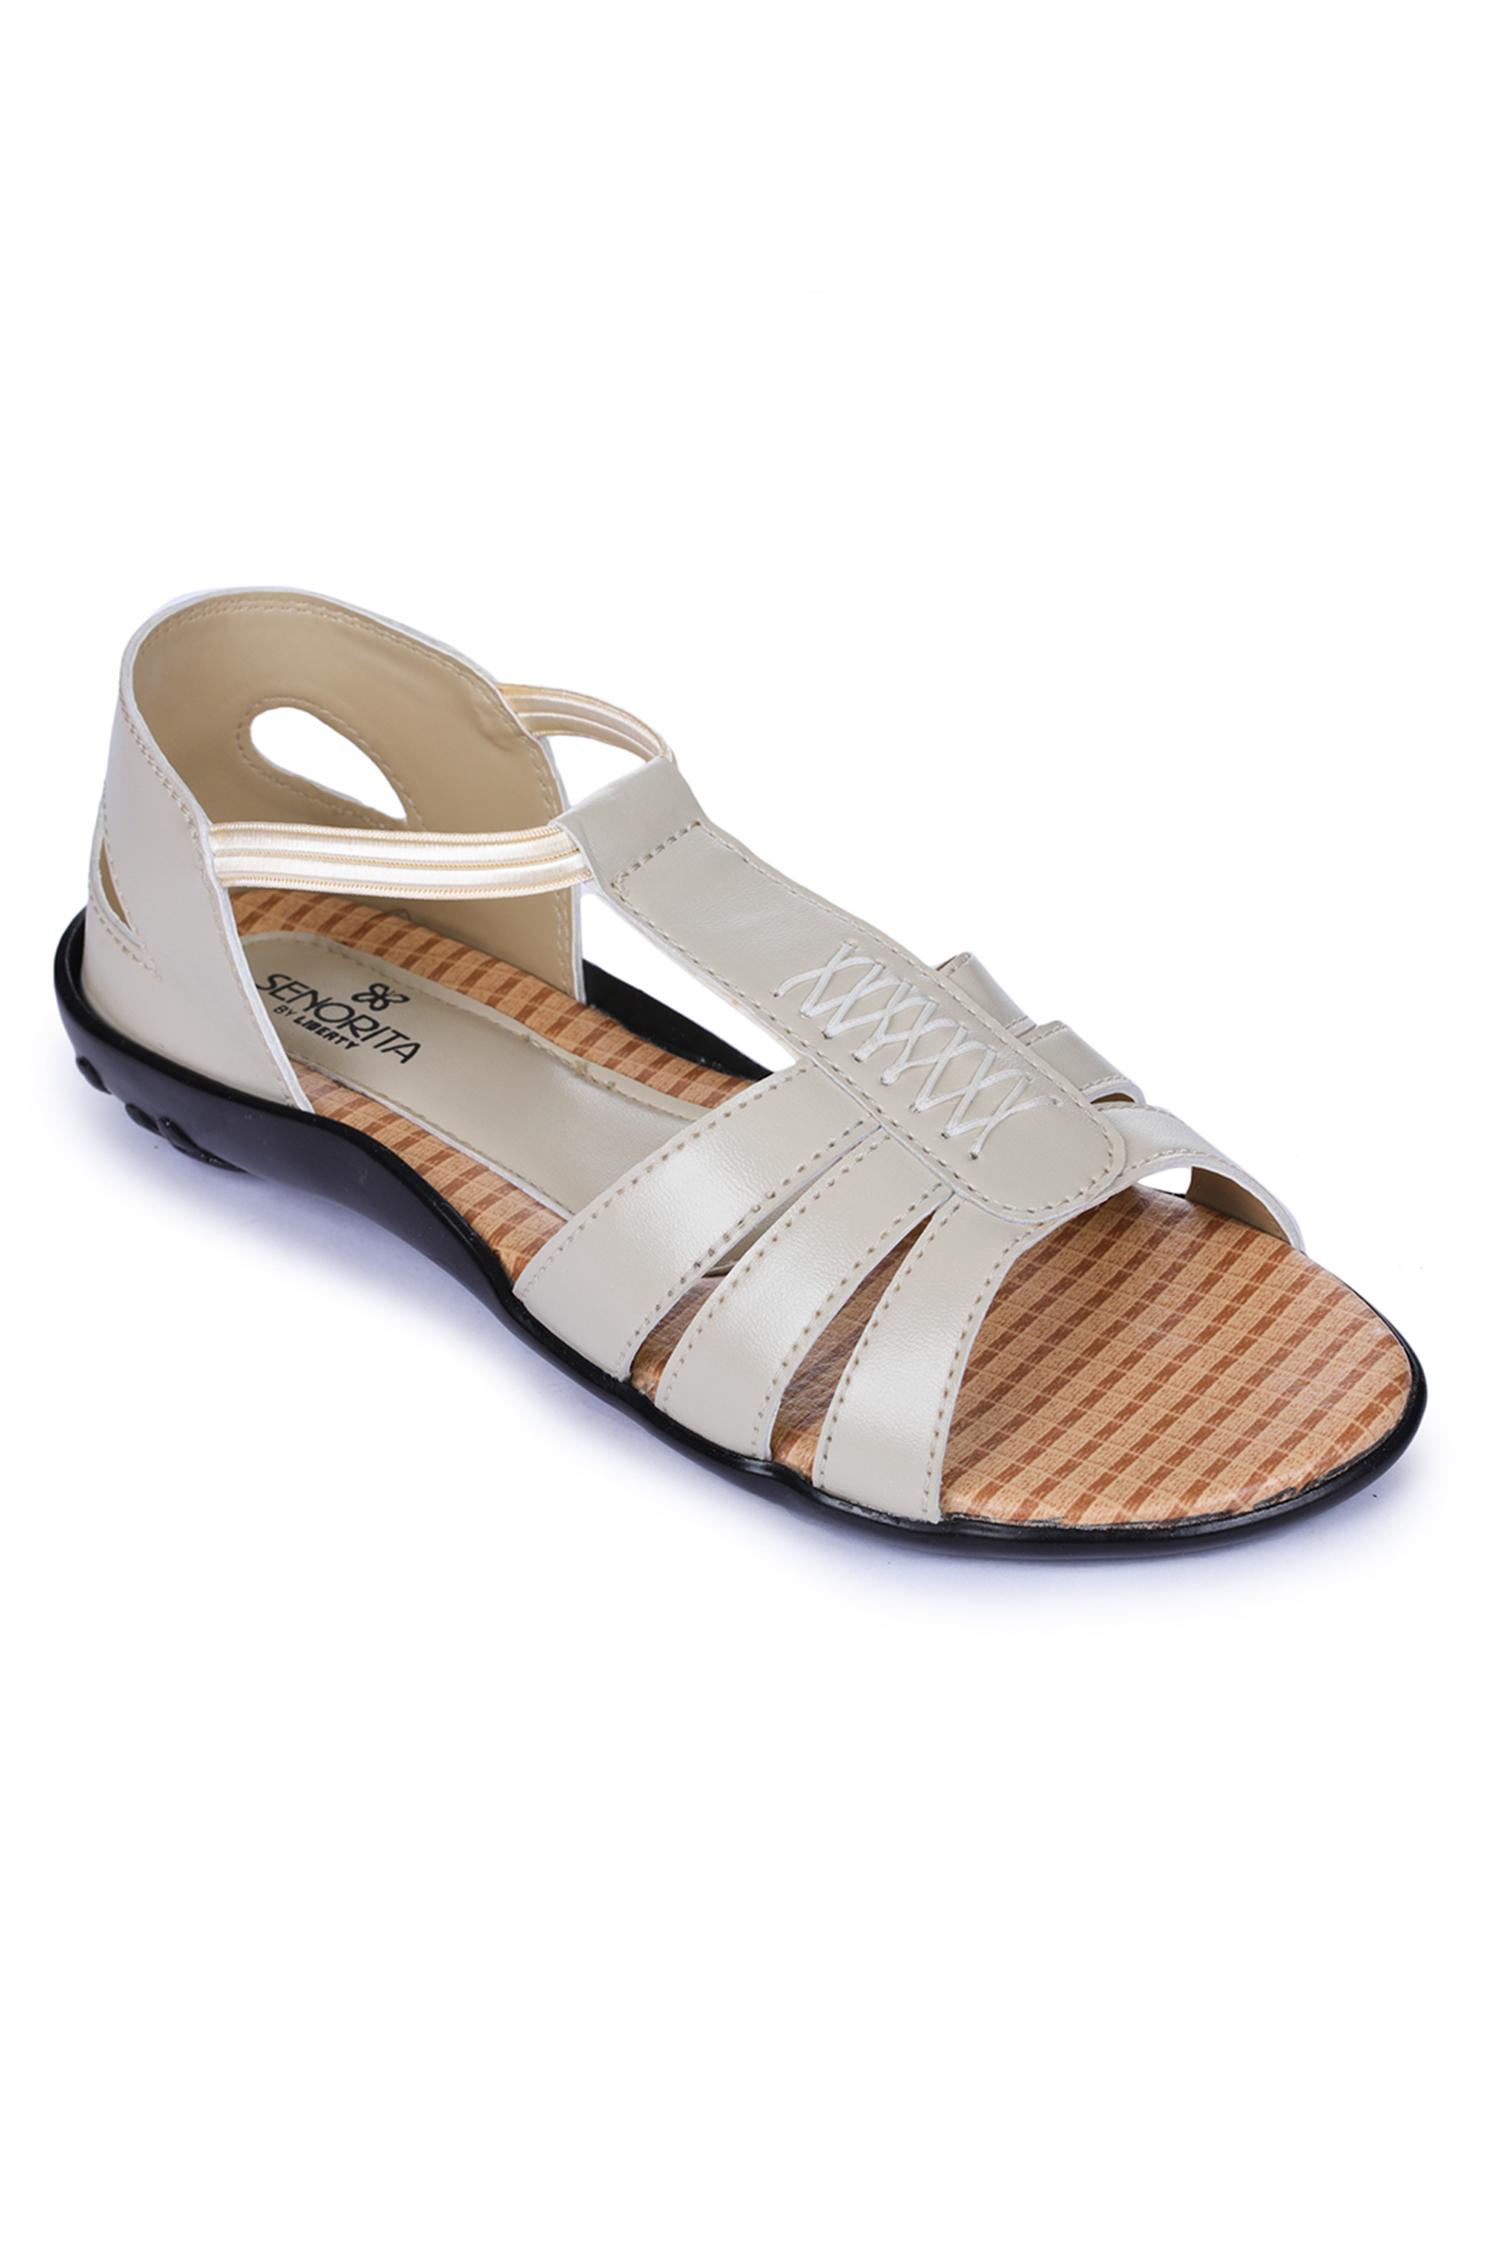 Liberty | Liberty Senorita Beige Fashion Sandals FT-713_Beige For - Women